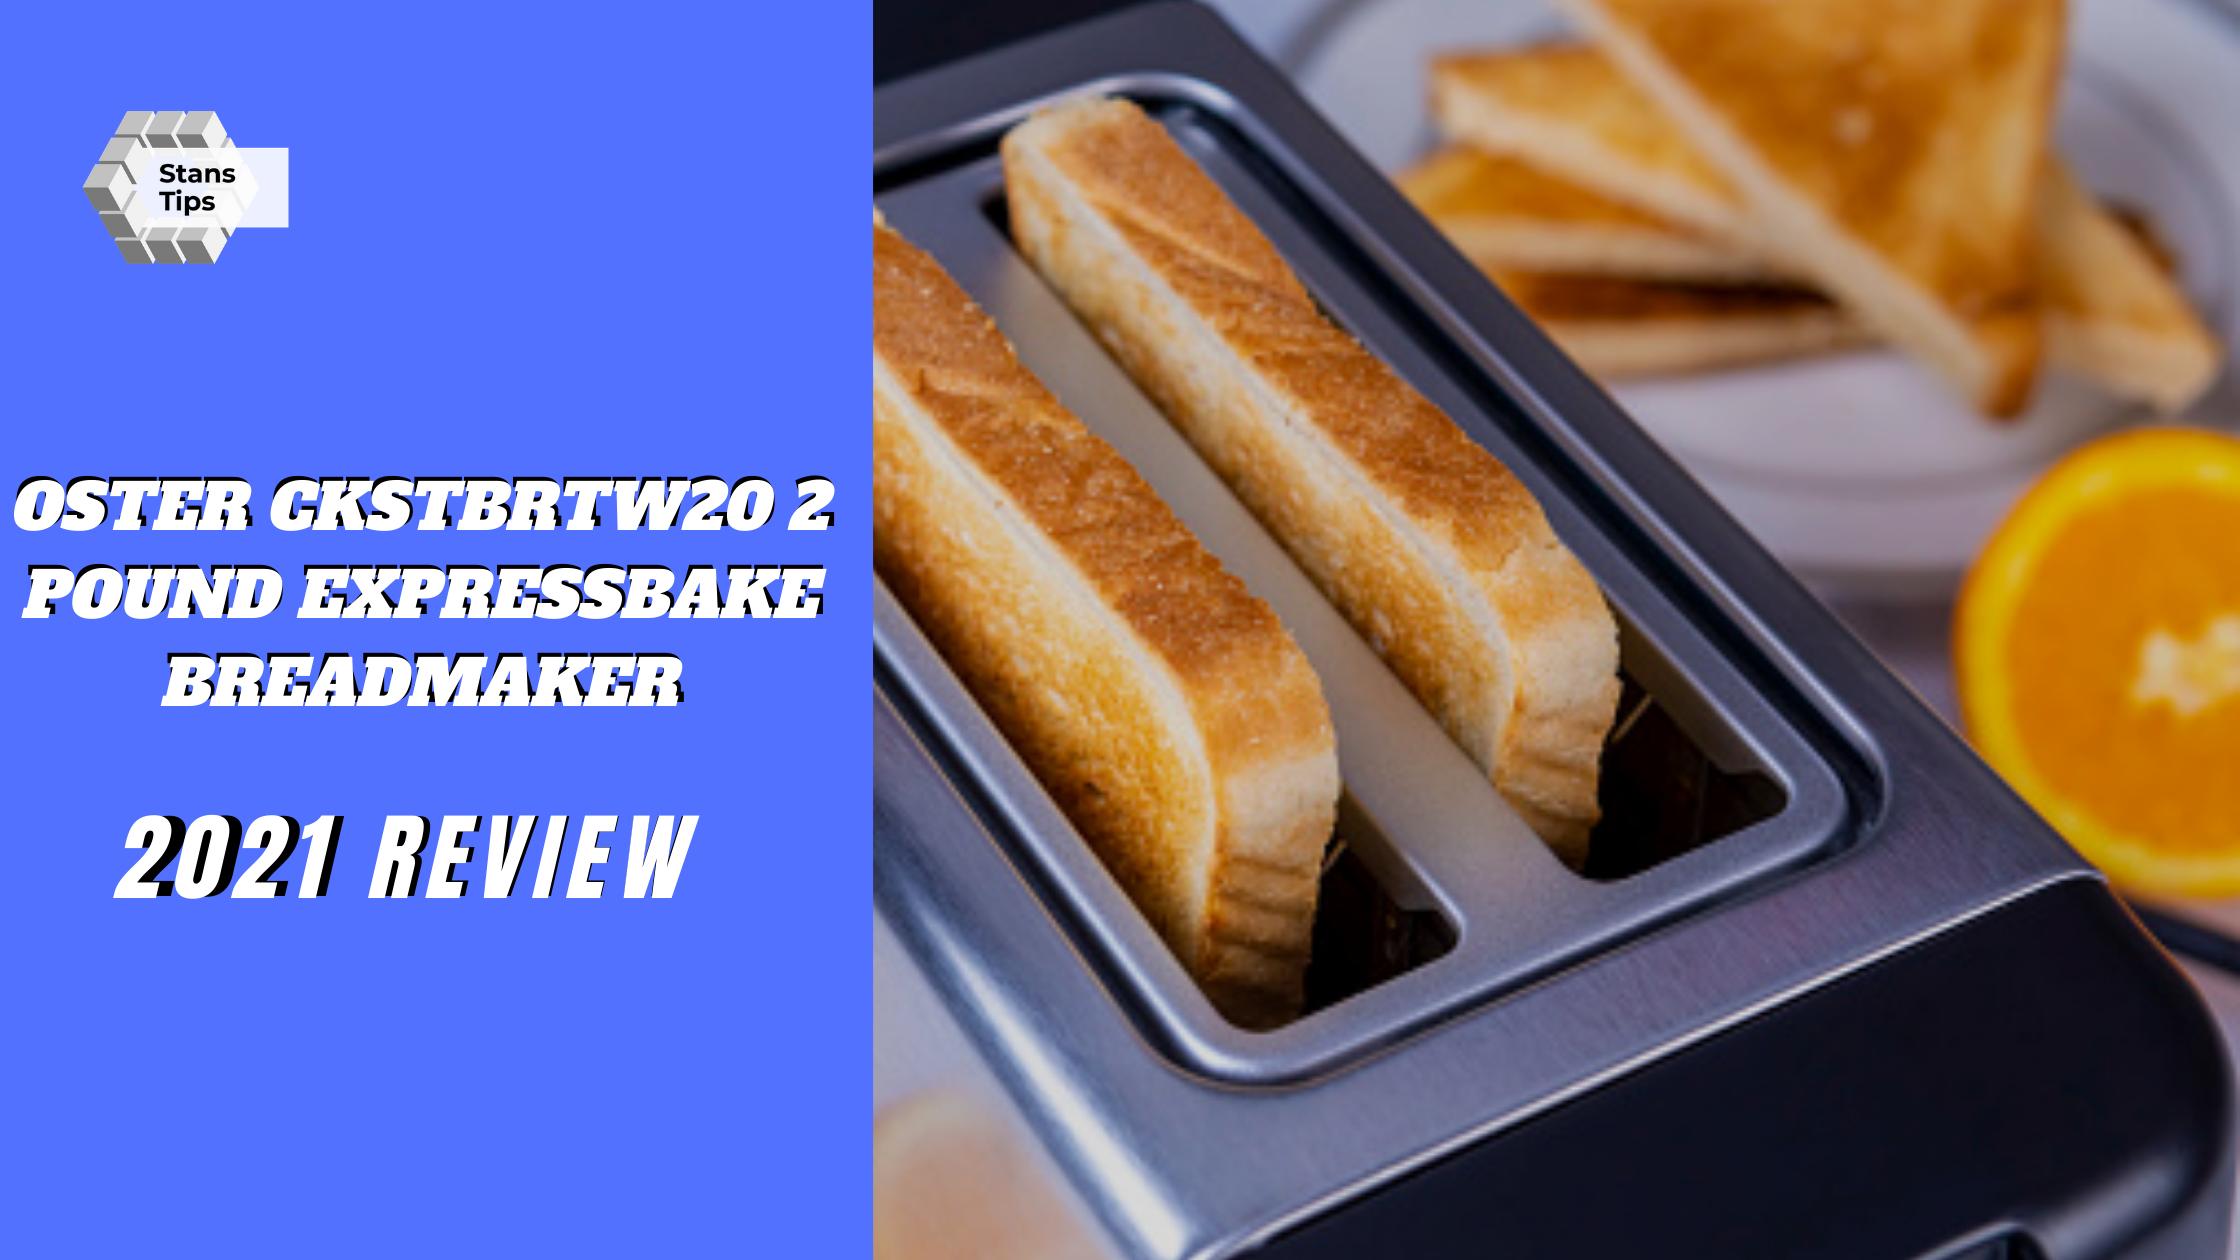 Oster ckstbrtw20 2 pound expressbake breadmaker review 2021